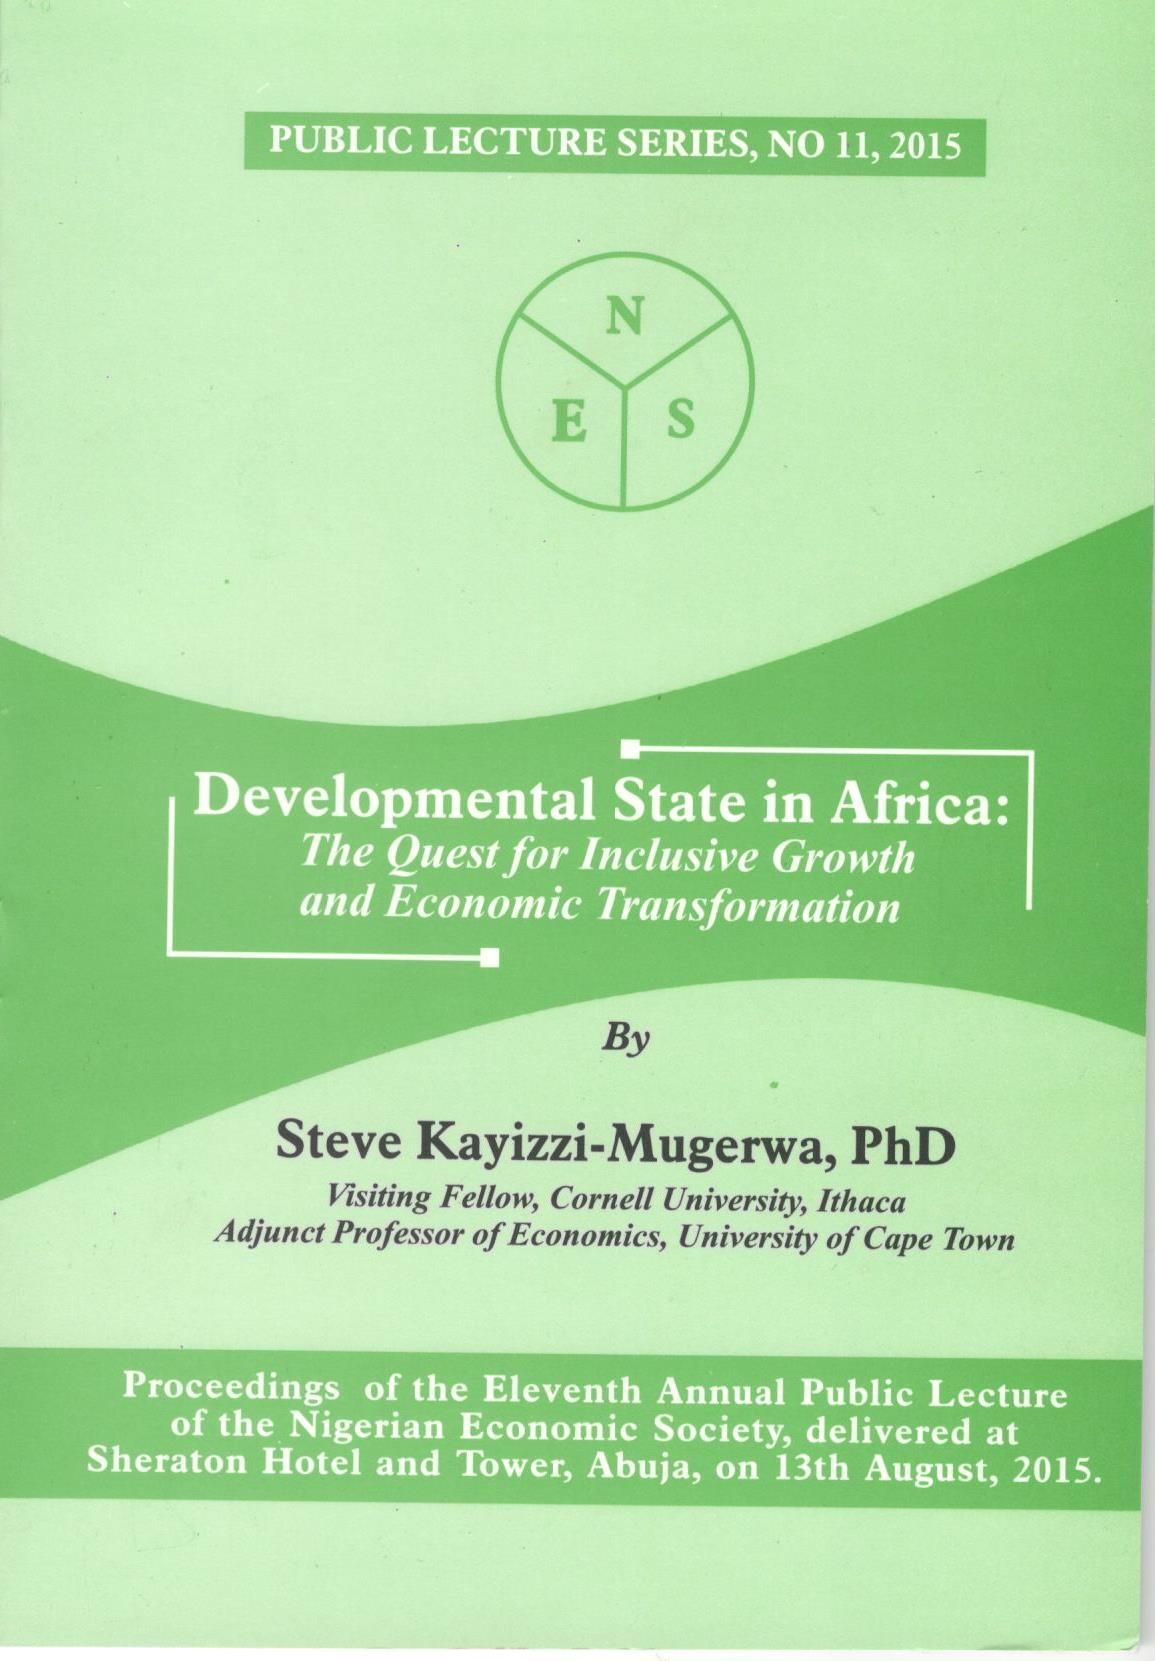 Nigerian Economic Society, NES